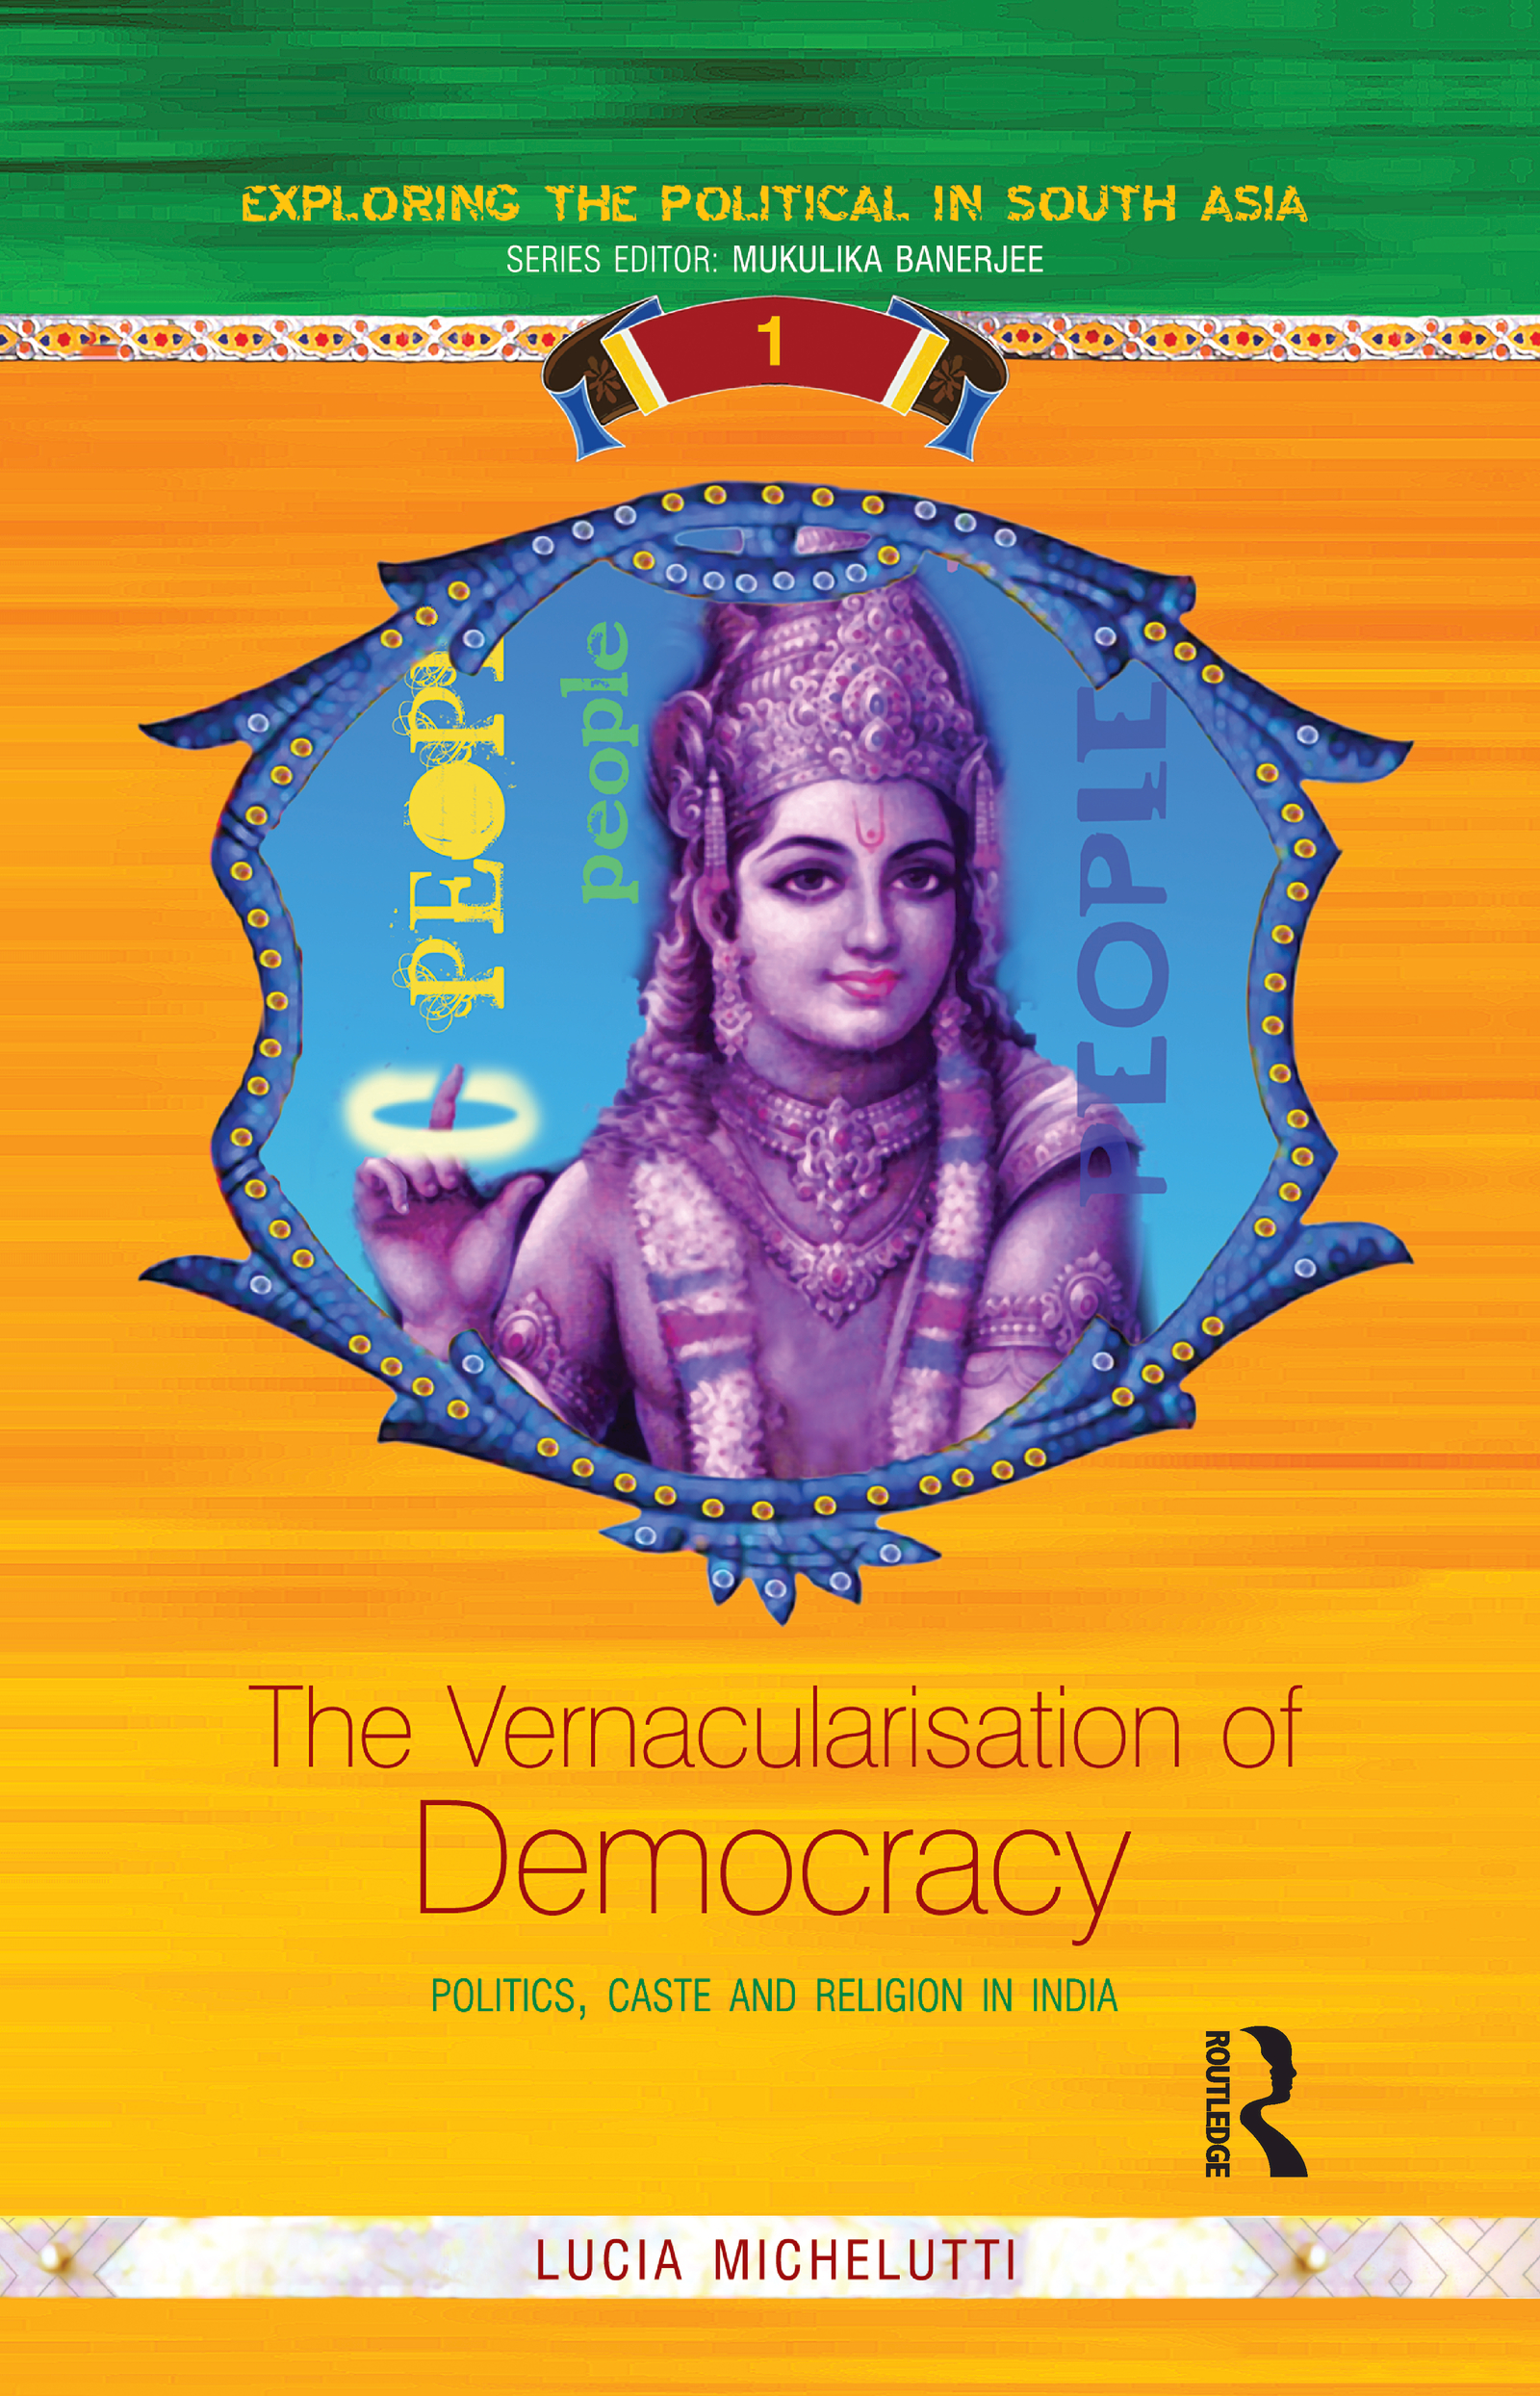 The Vernacularisation of Democracy